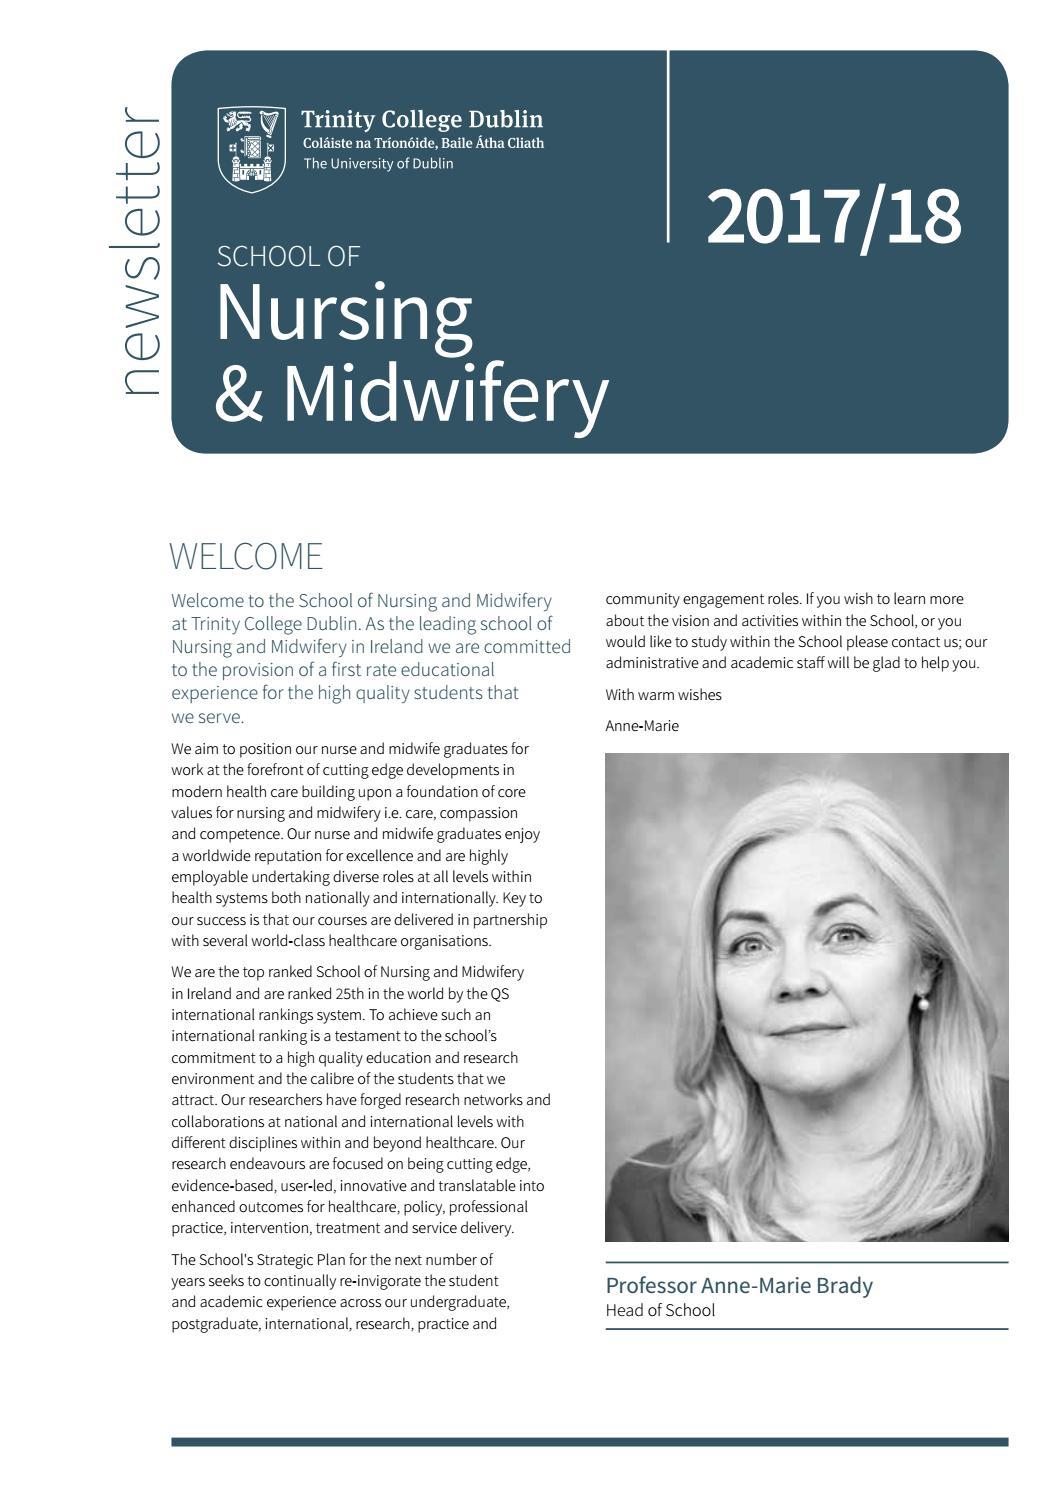 Amanda Horan Kennedy school of nursing & midwifery newsletter 2017/18tcd